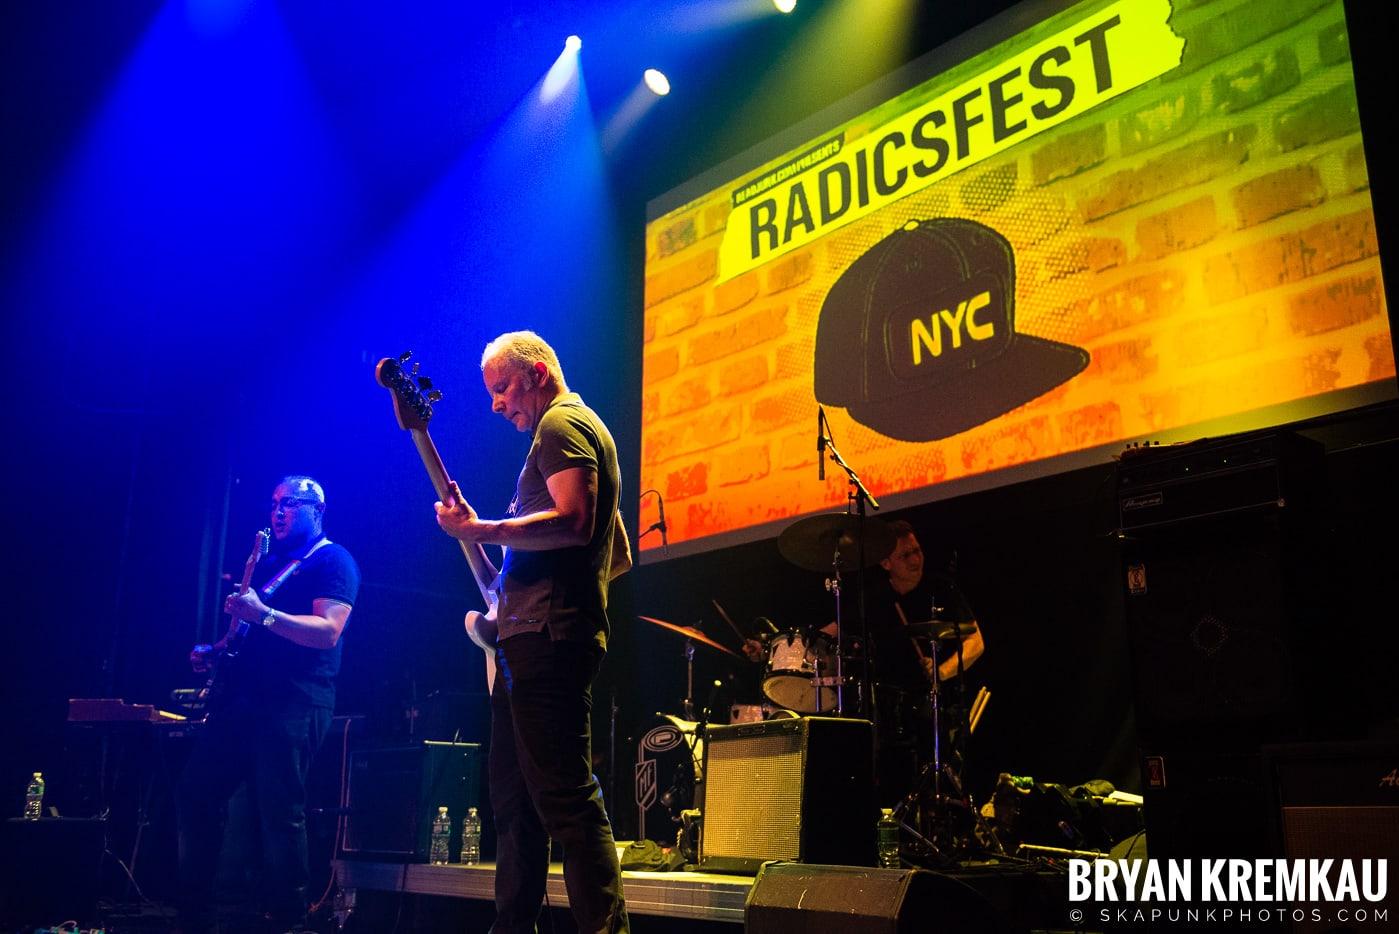 Rude Boy George @ Radicsfest, Gramercy Theatre, NYC - 7.19.19 (24)